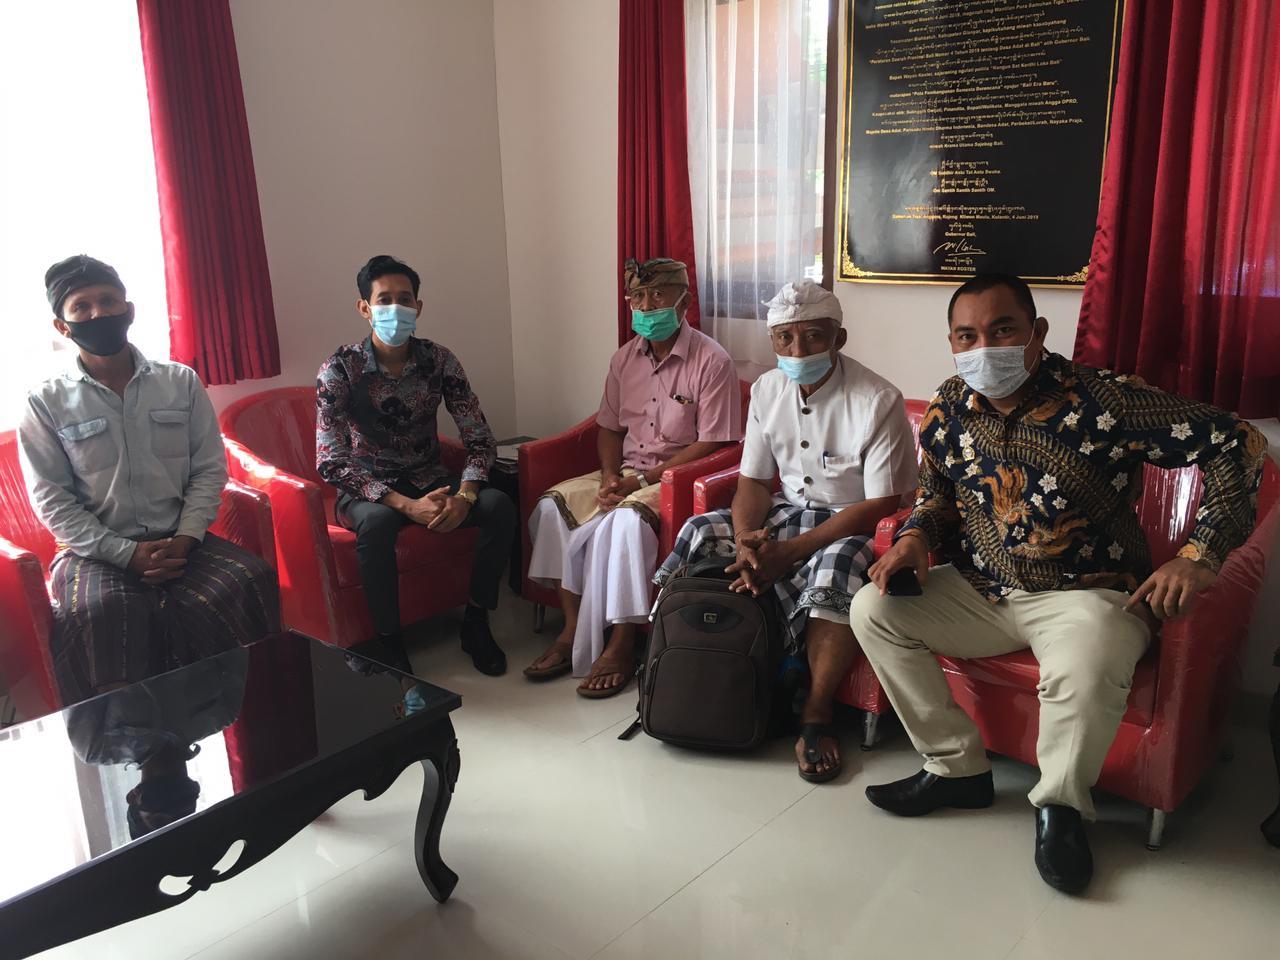 Jro Wiryasa Datangi MDA Bali Sampaikan Surat Keberatan Diberhentikan Sepihak